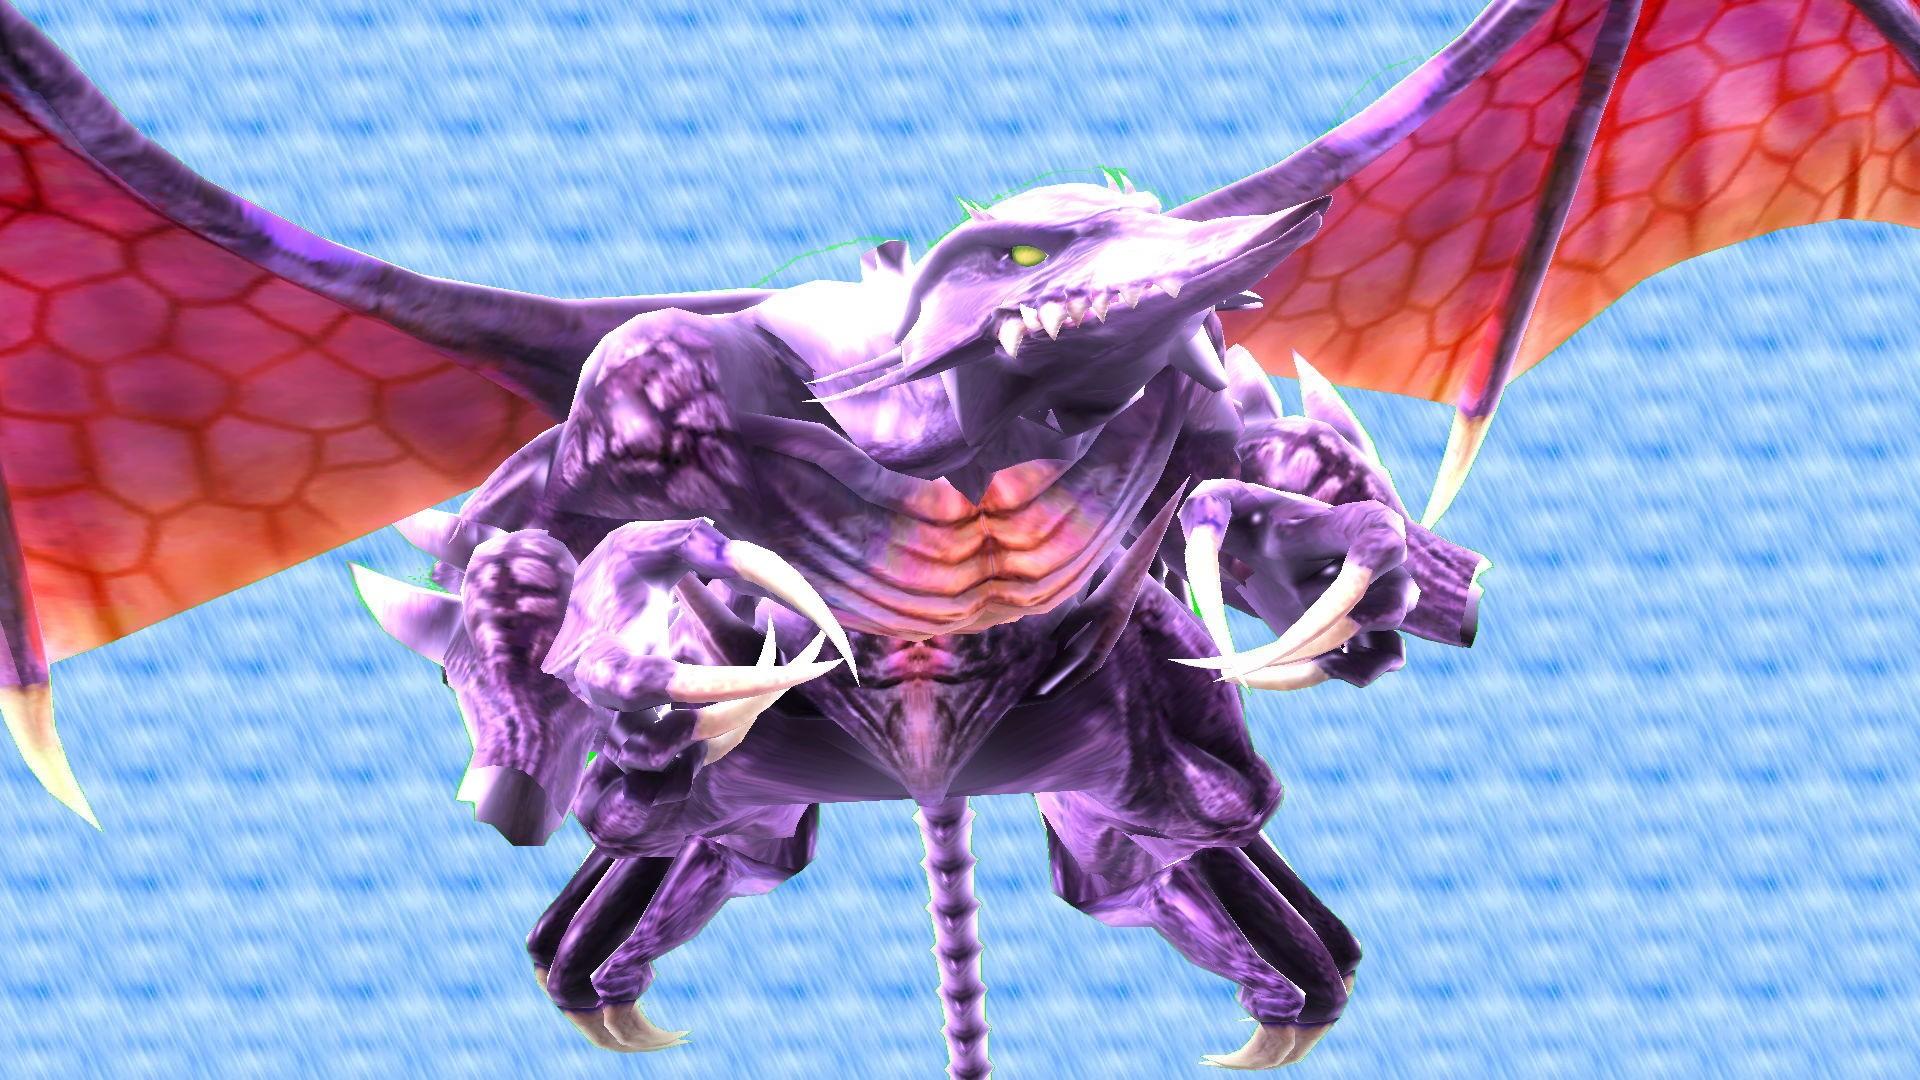 Ridley Bowser Skin Super Smash Bros Wii U Works In